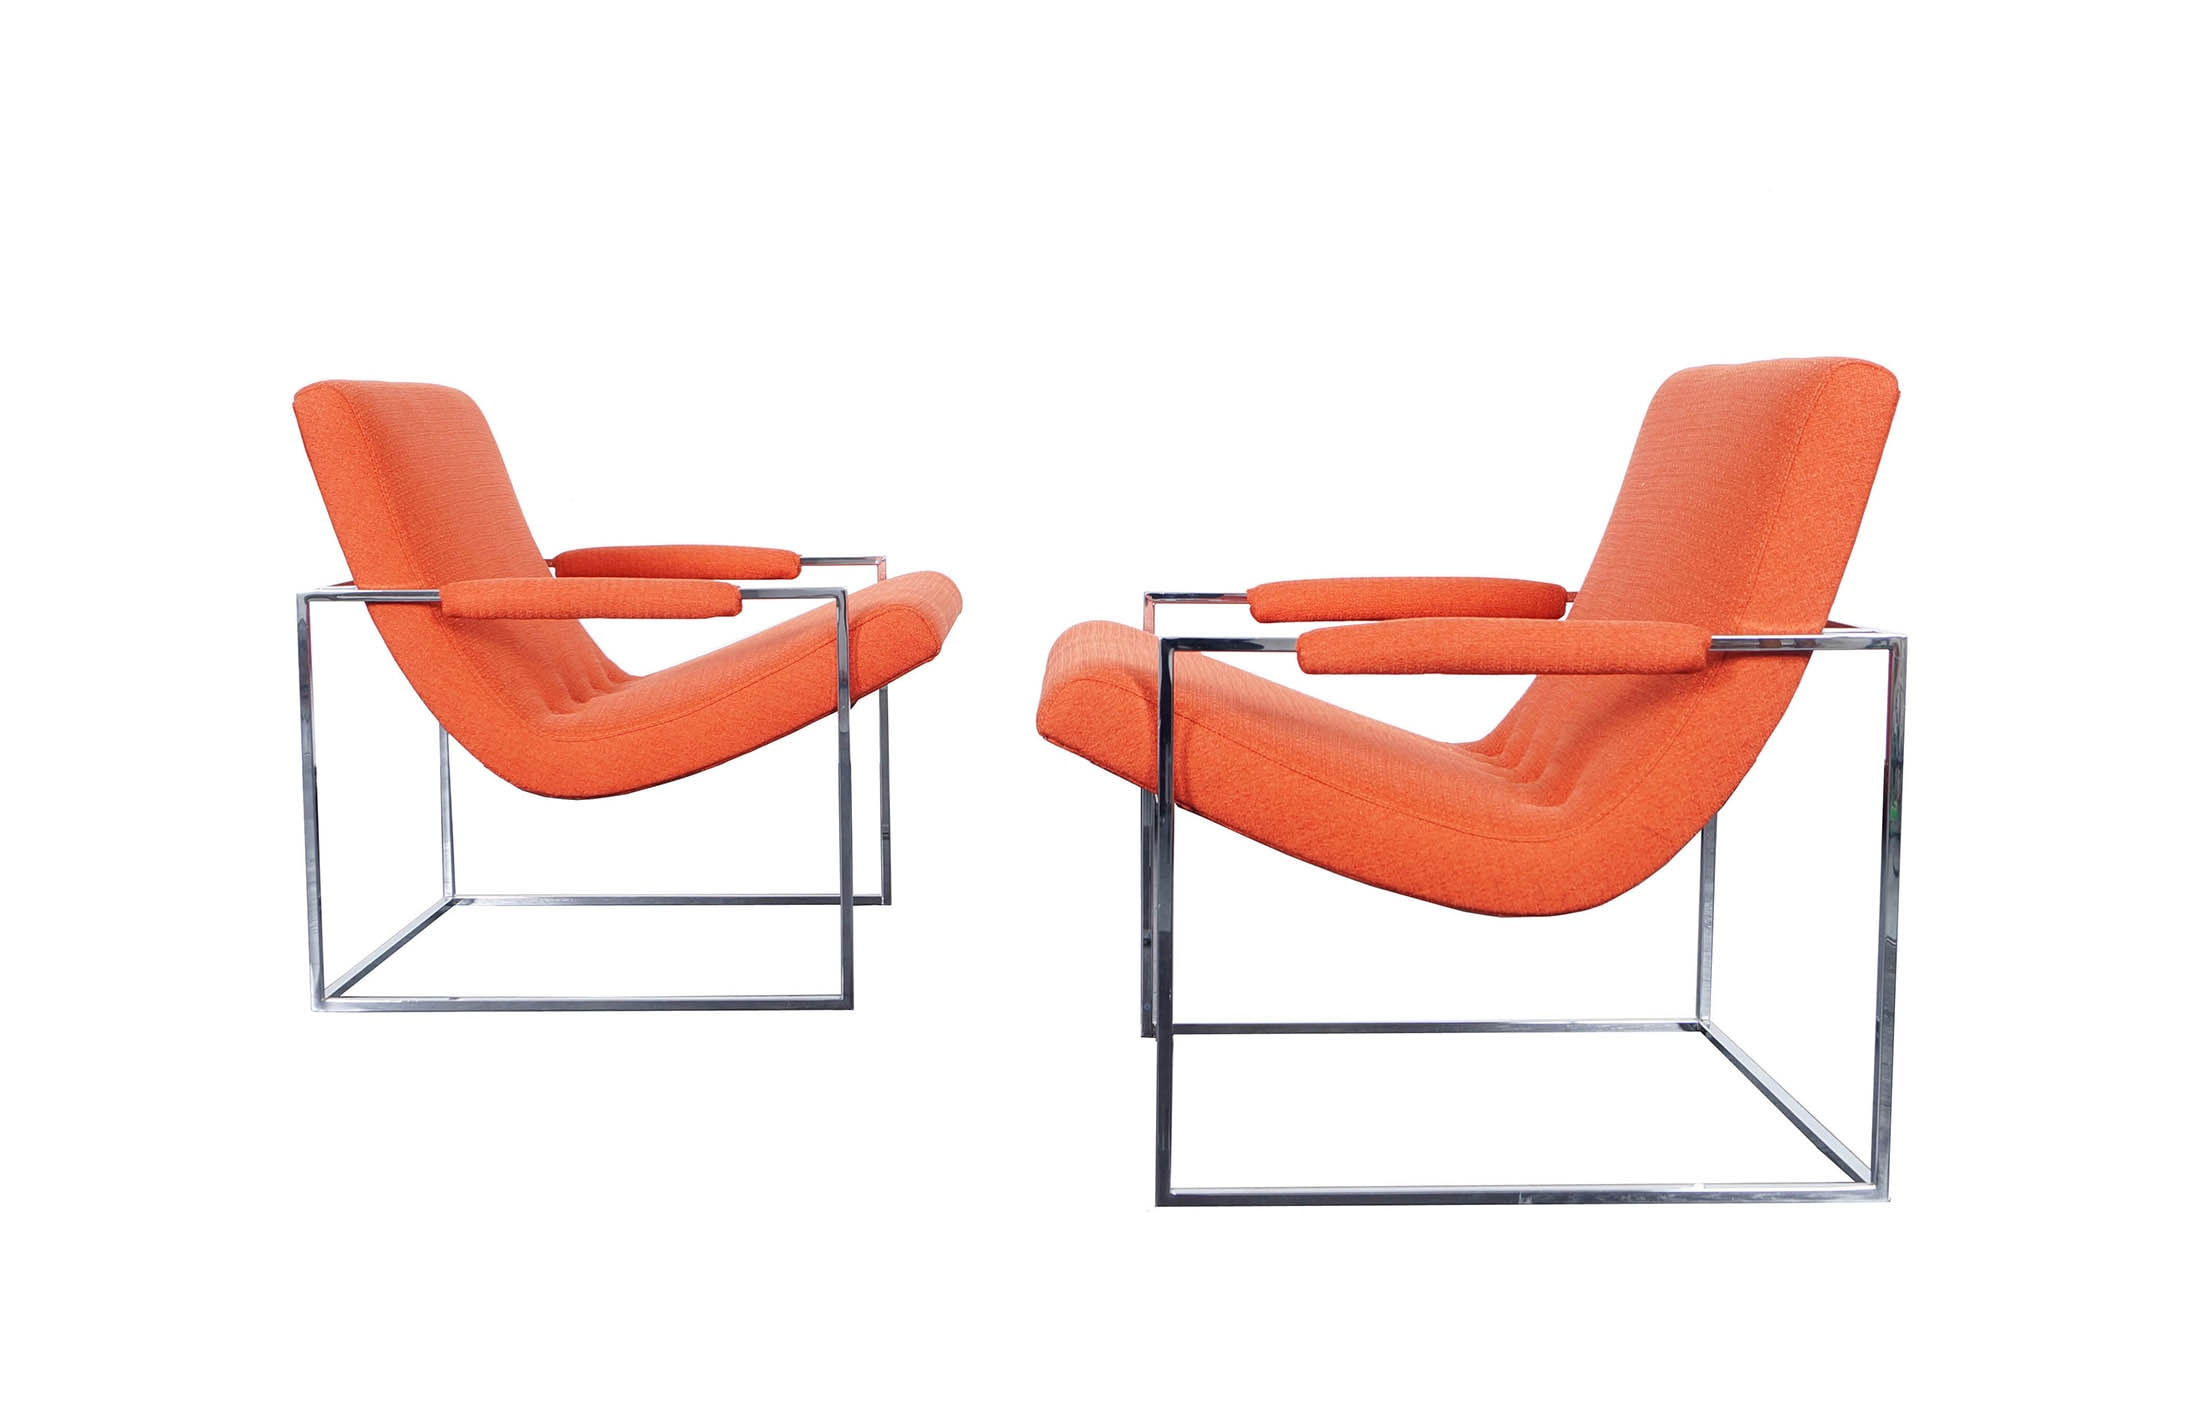 Vintage Chrome Lounge Chairs by Milo Baughman